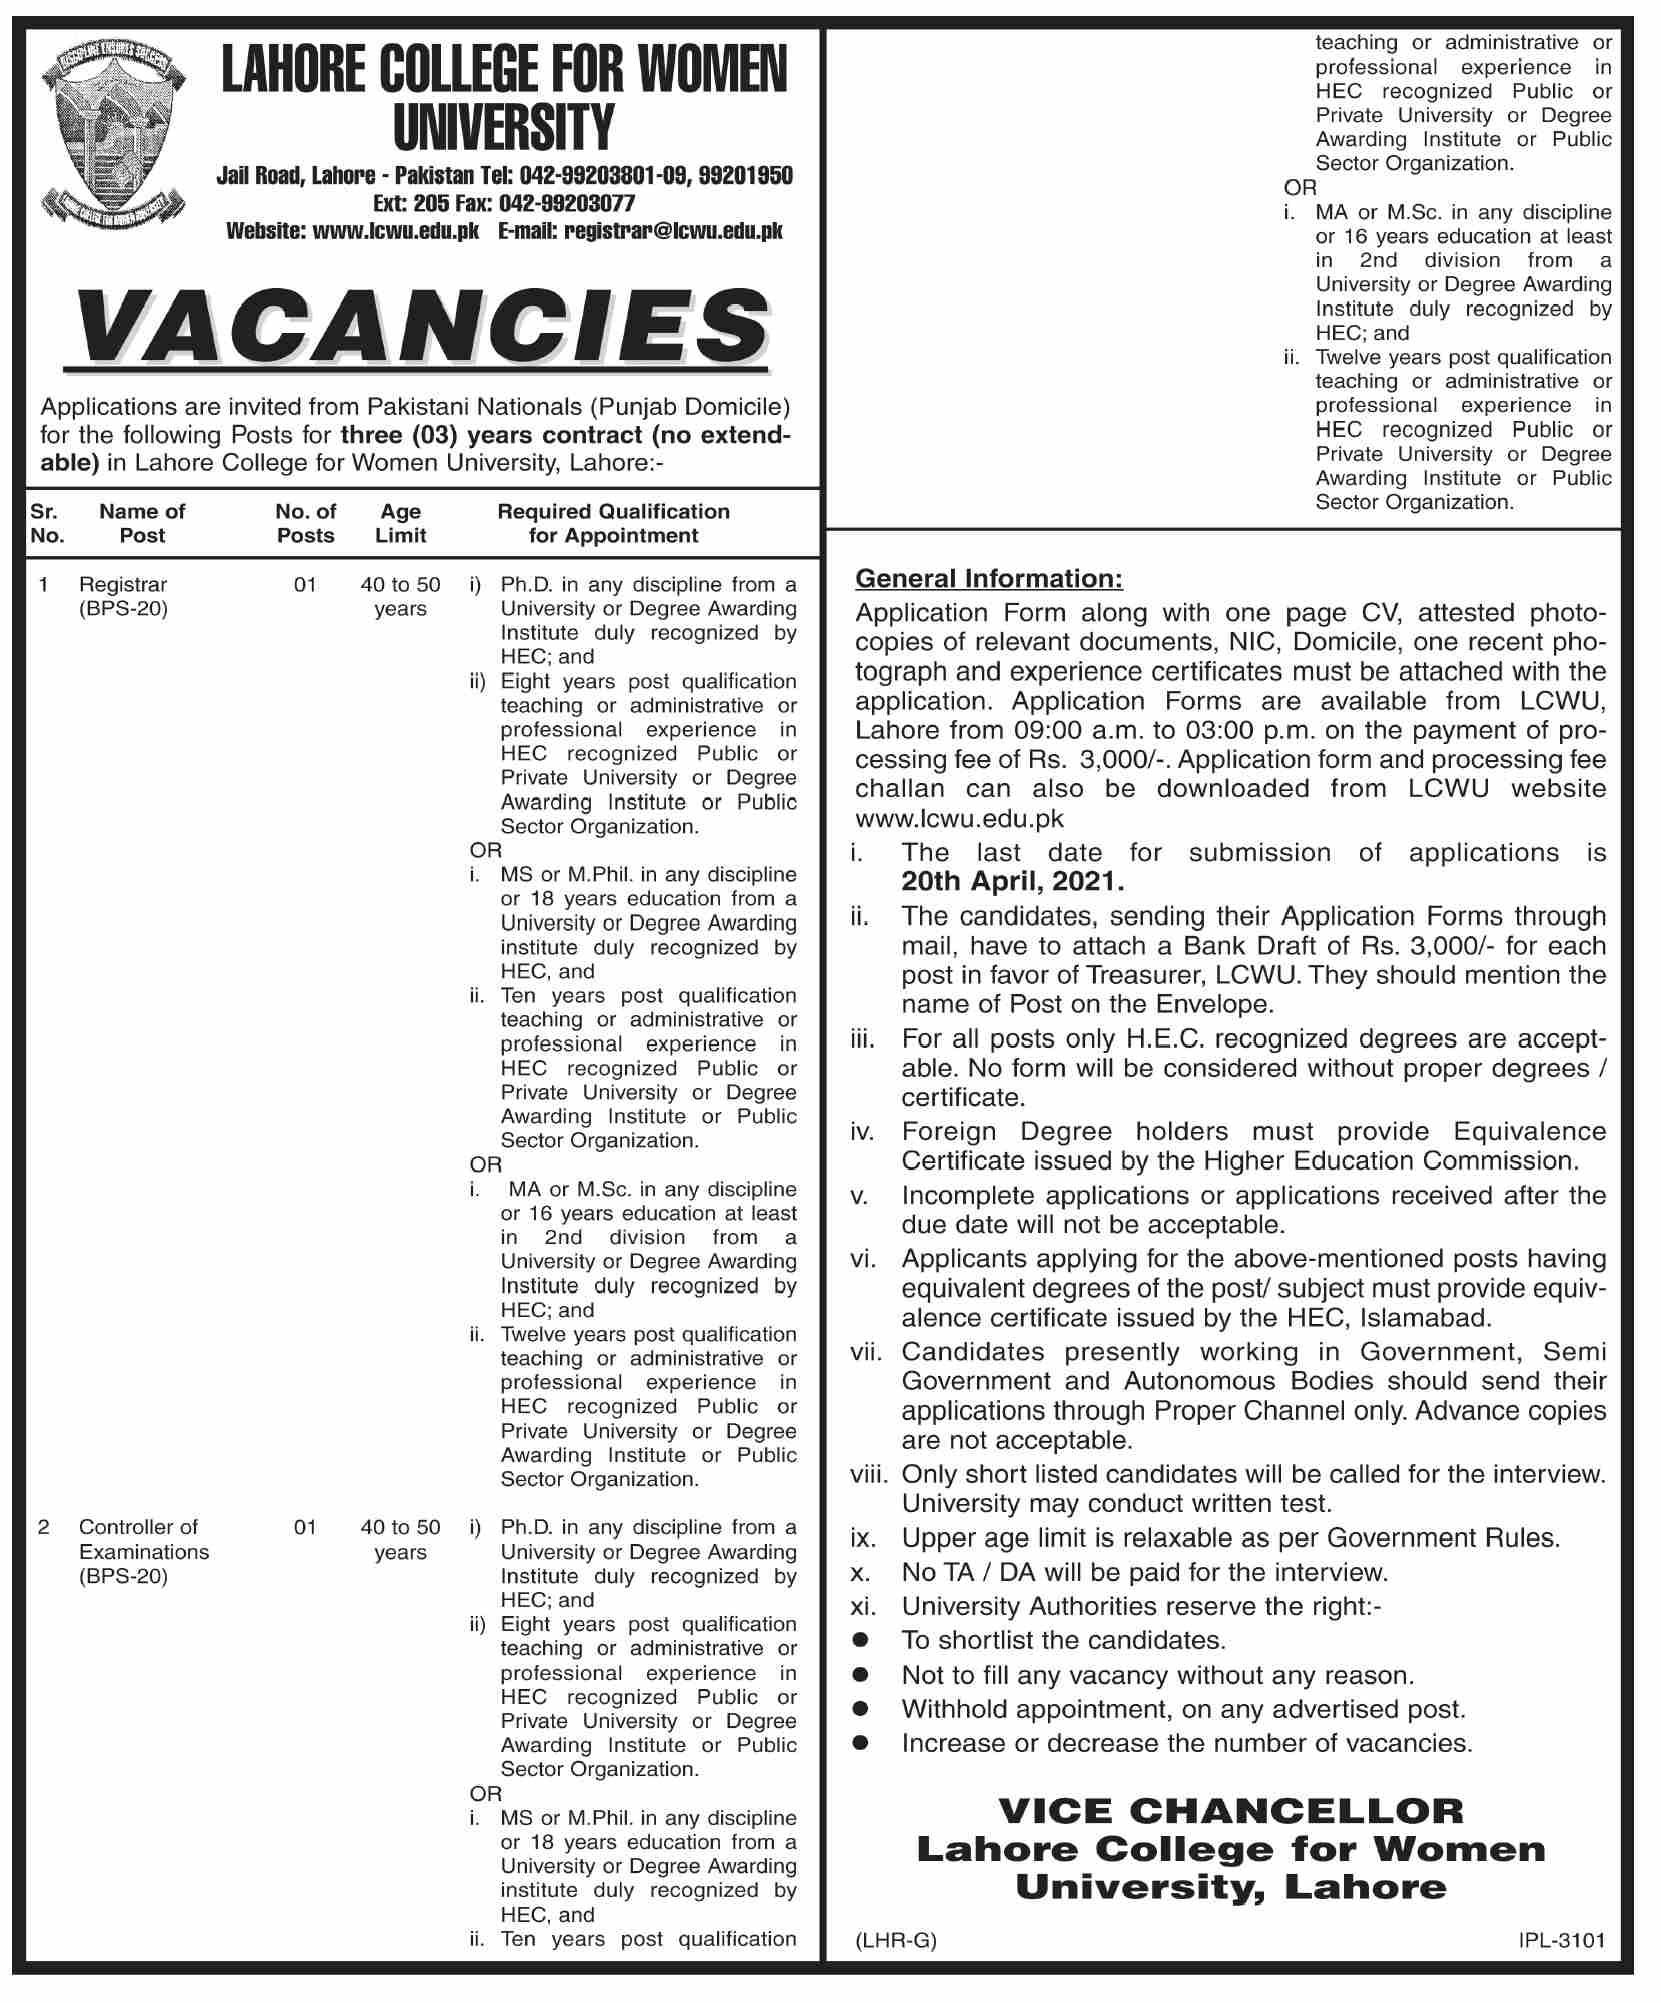 Lahore College For Women University (LCWU) Jobs 2021 in Pakistan